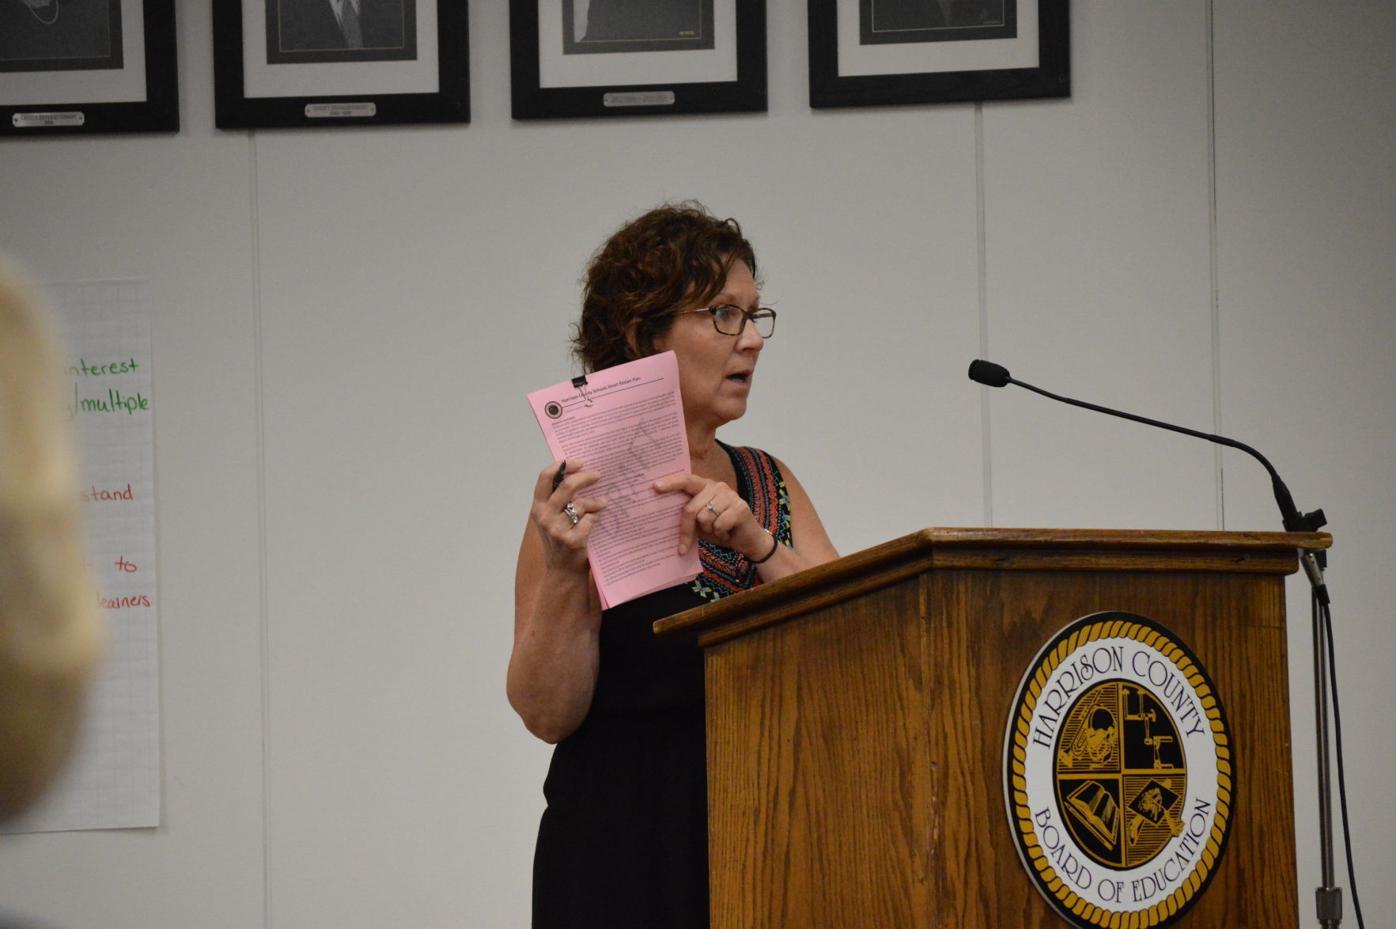 Jill Steele, in July 2020, about re-entry plans